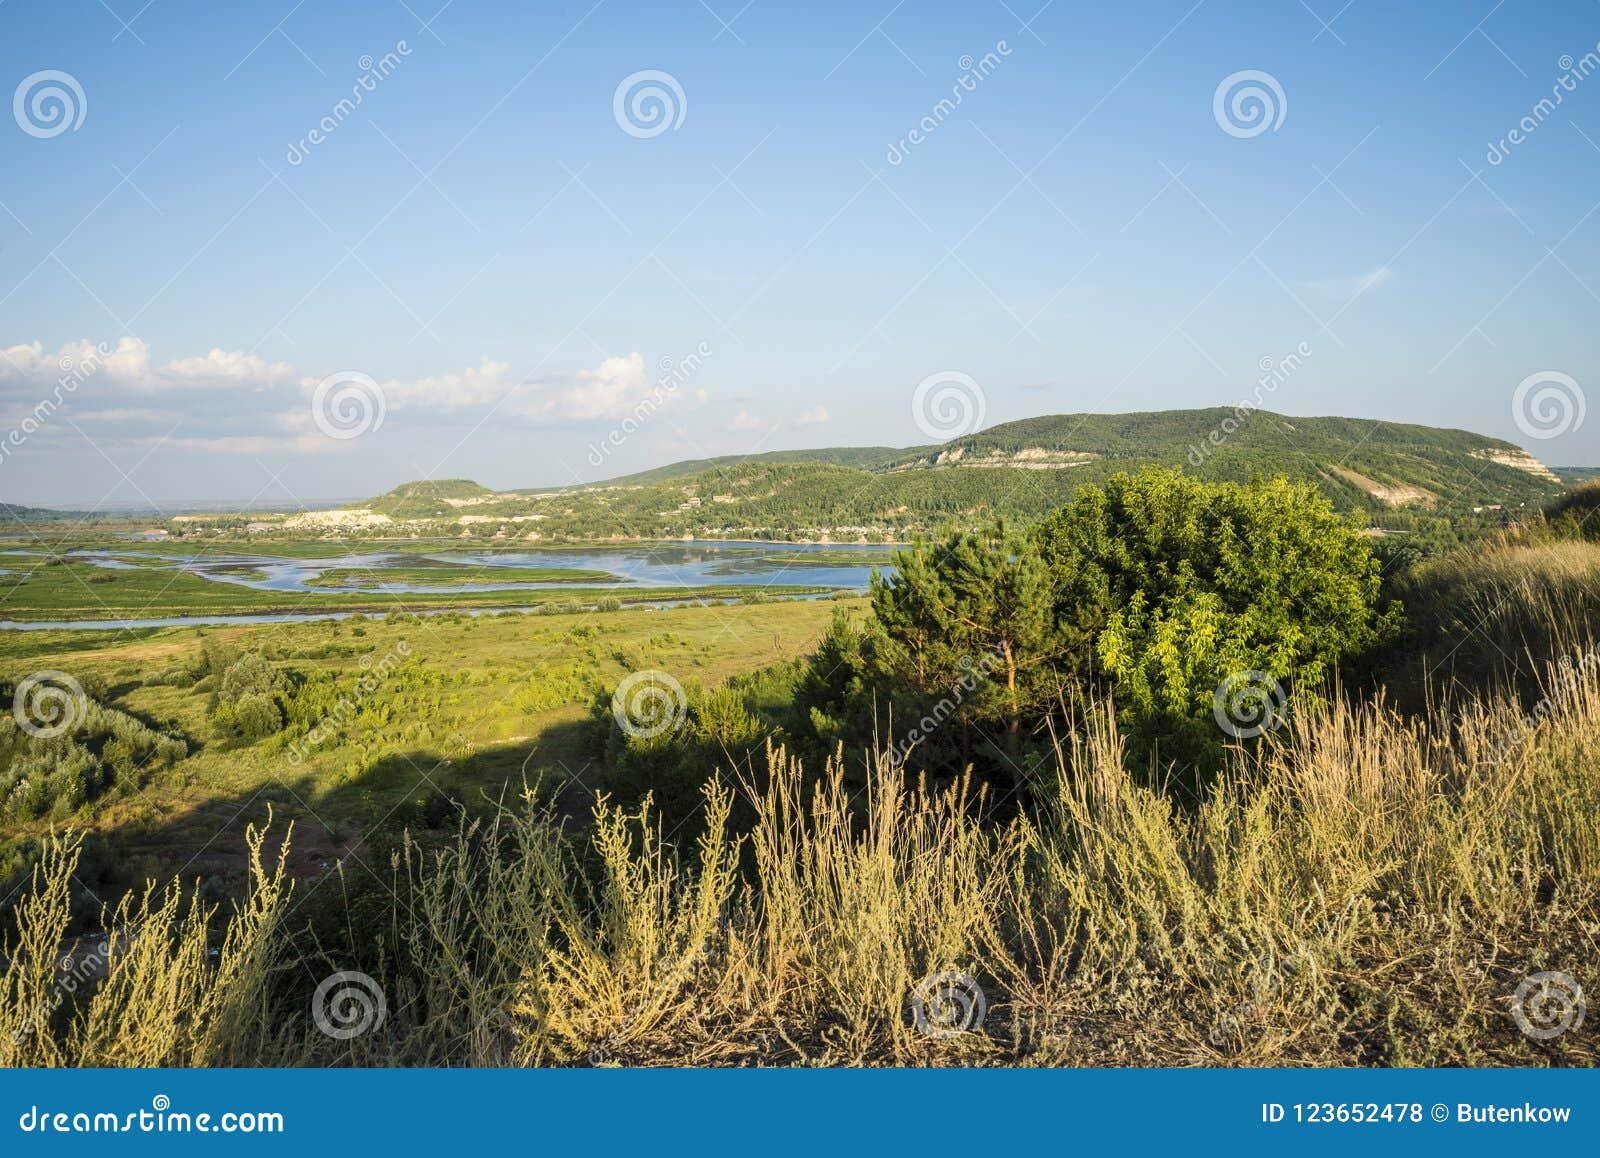 Tsarev Kurgan, Samara: description, location and interesting facts 29